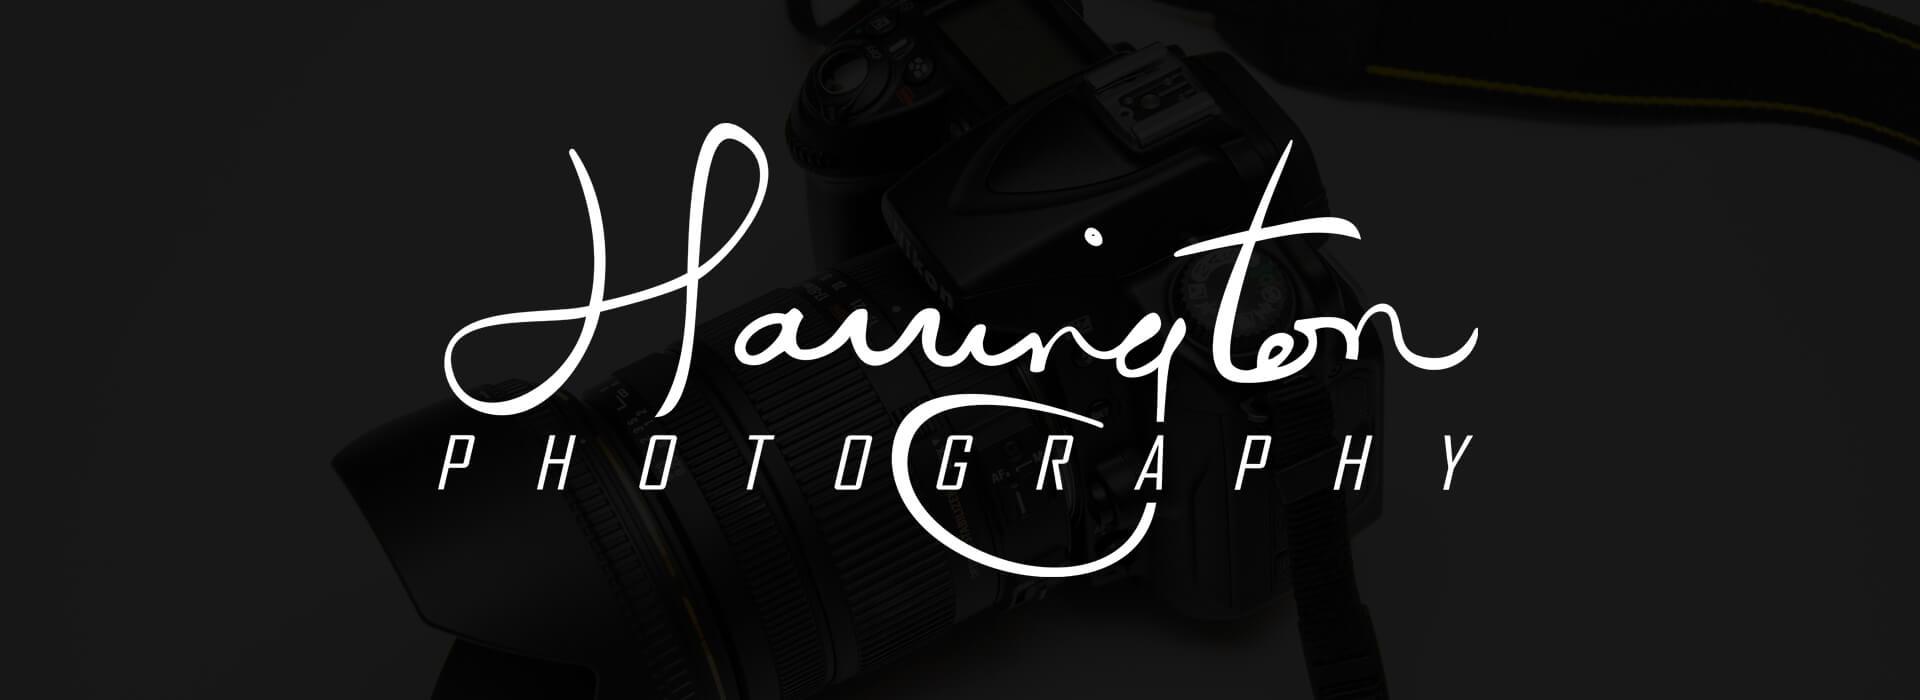 harrington photography customer page header